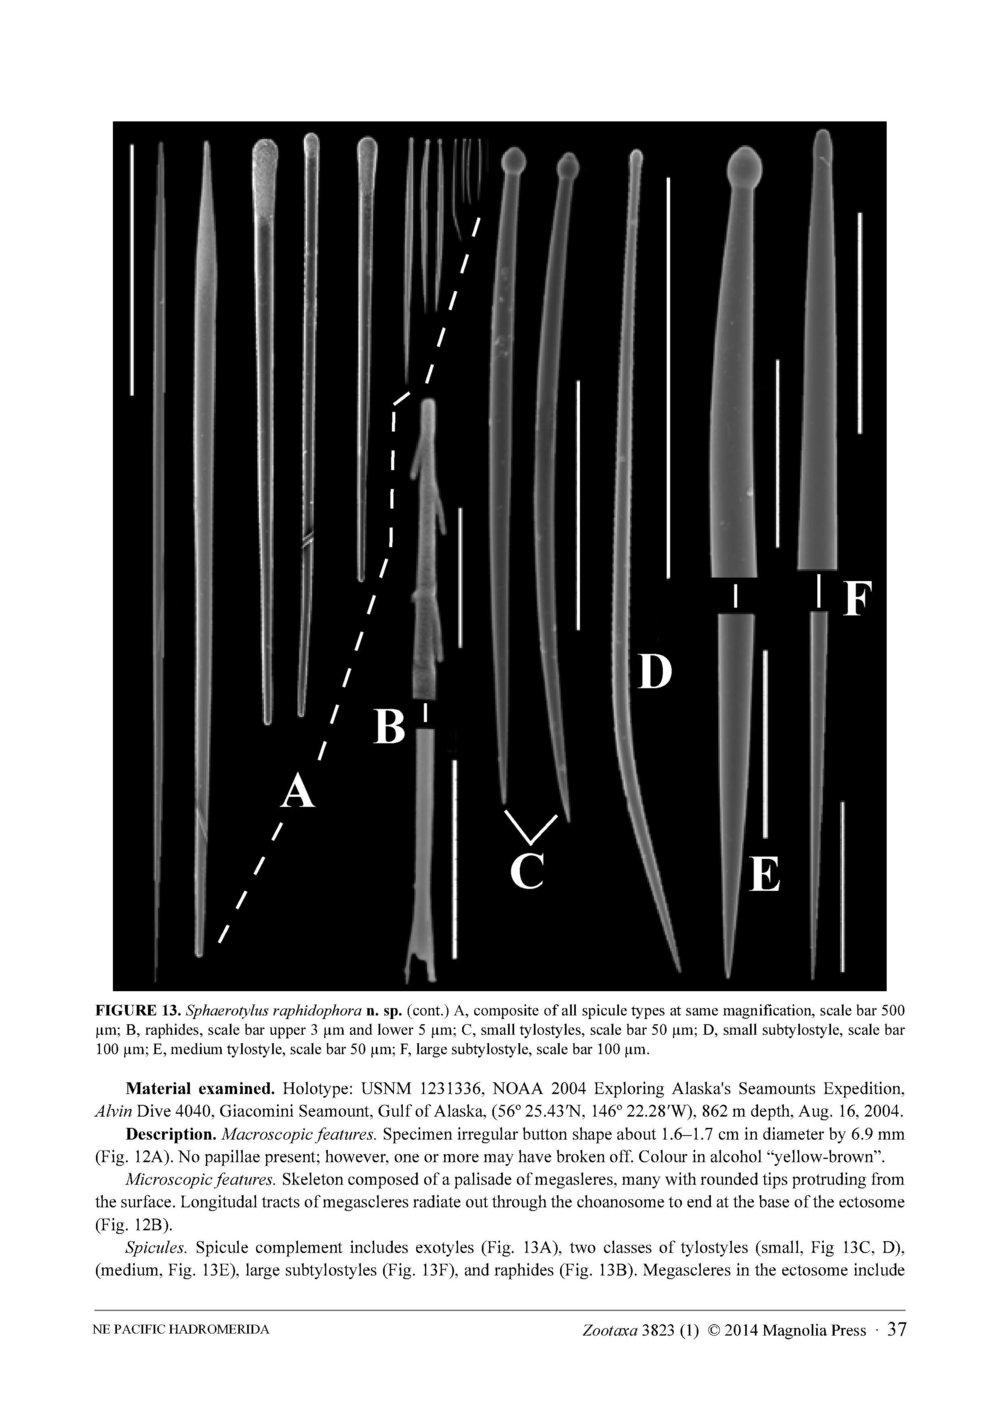 Austin et al 2014 NE Pacific Hadromerids_Page_37.jpg